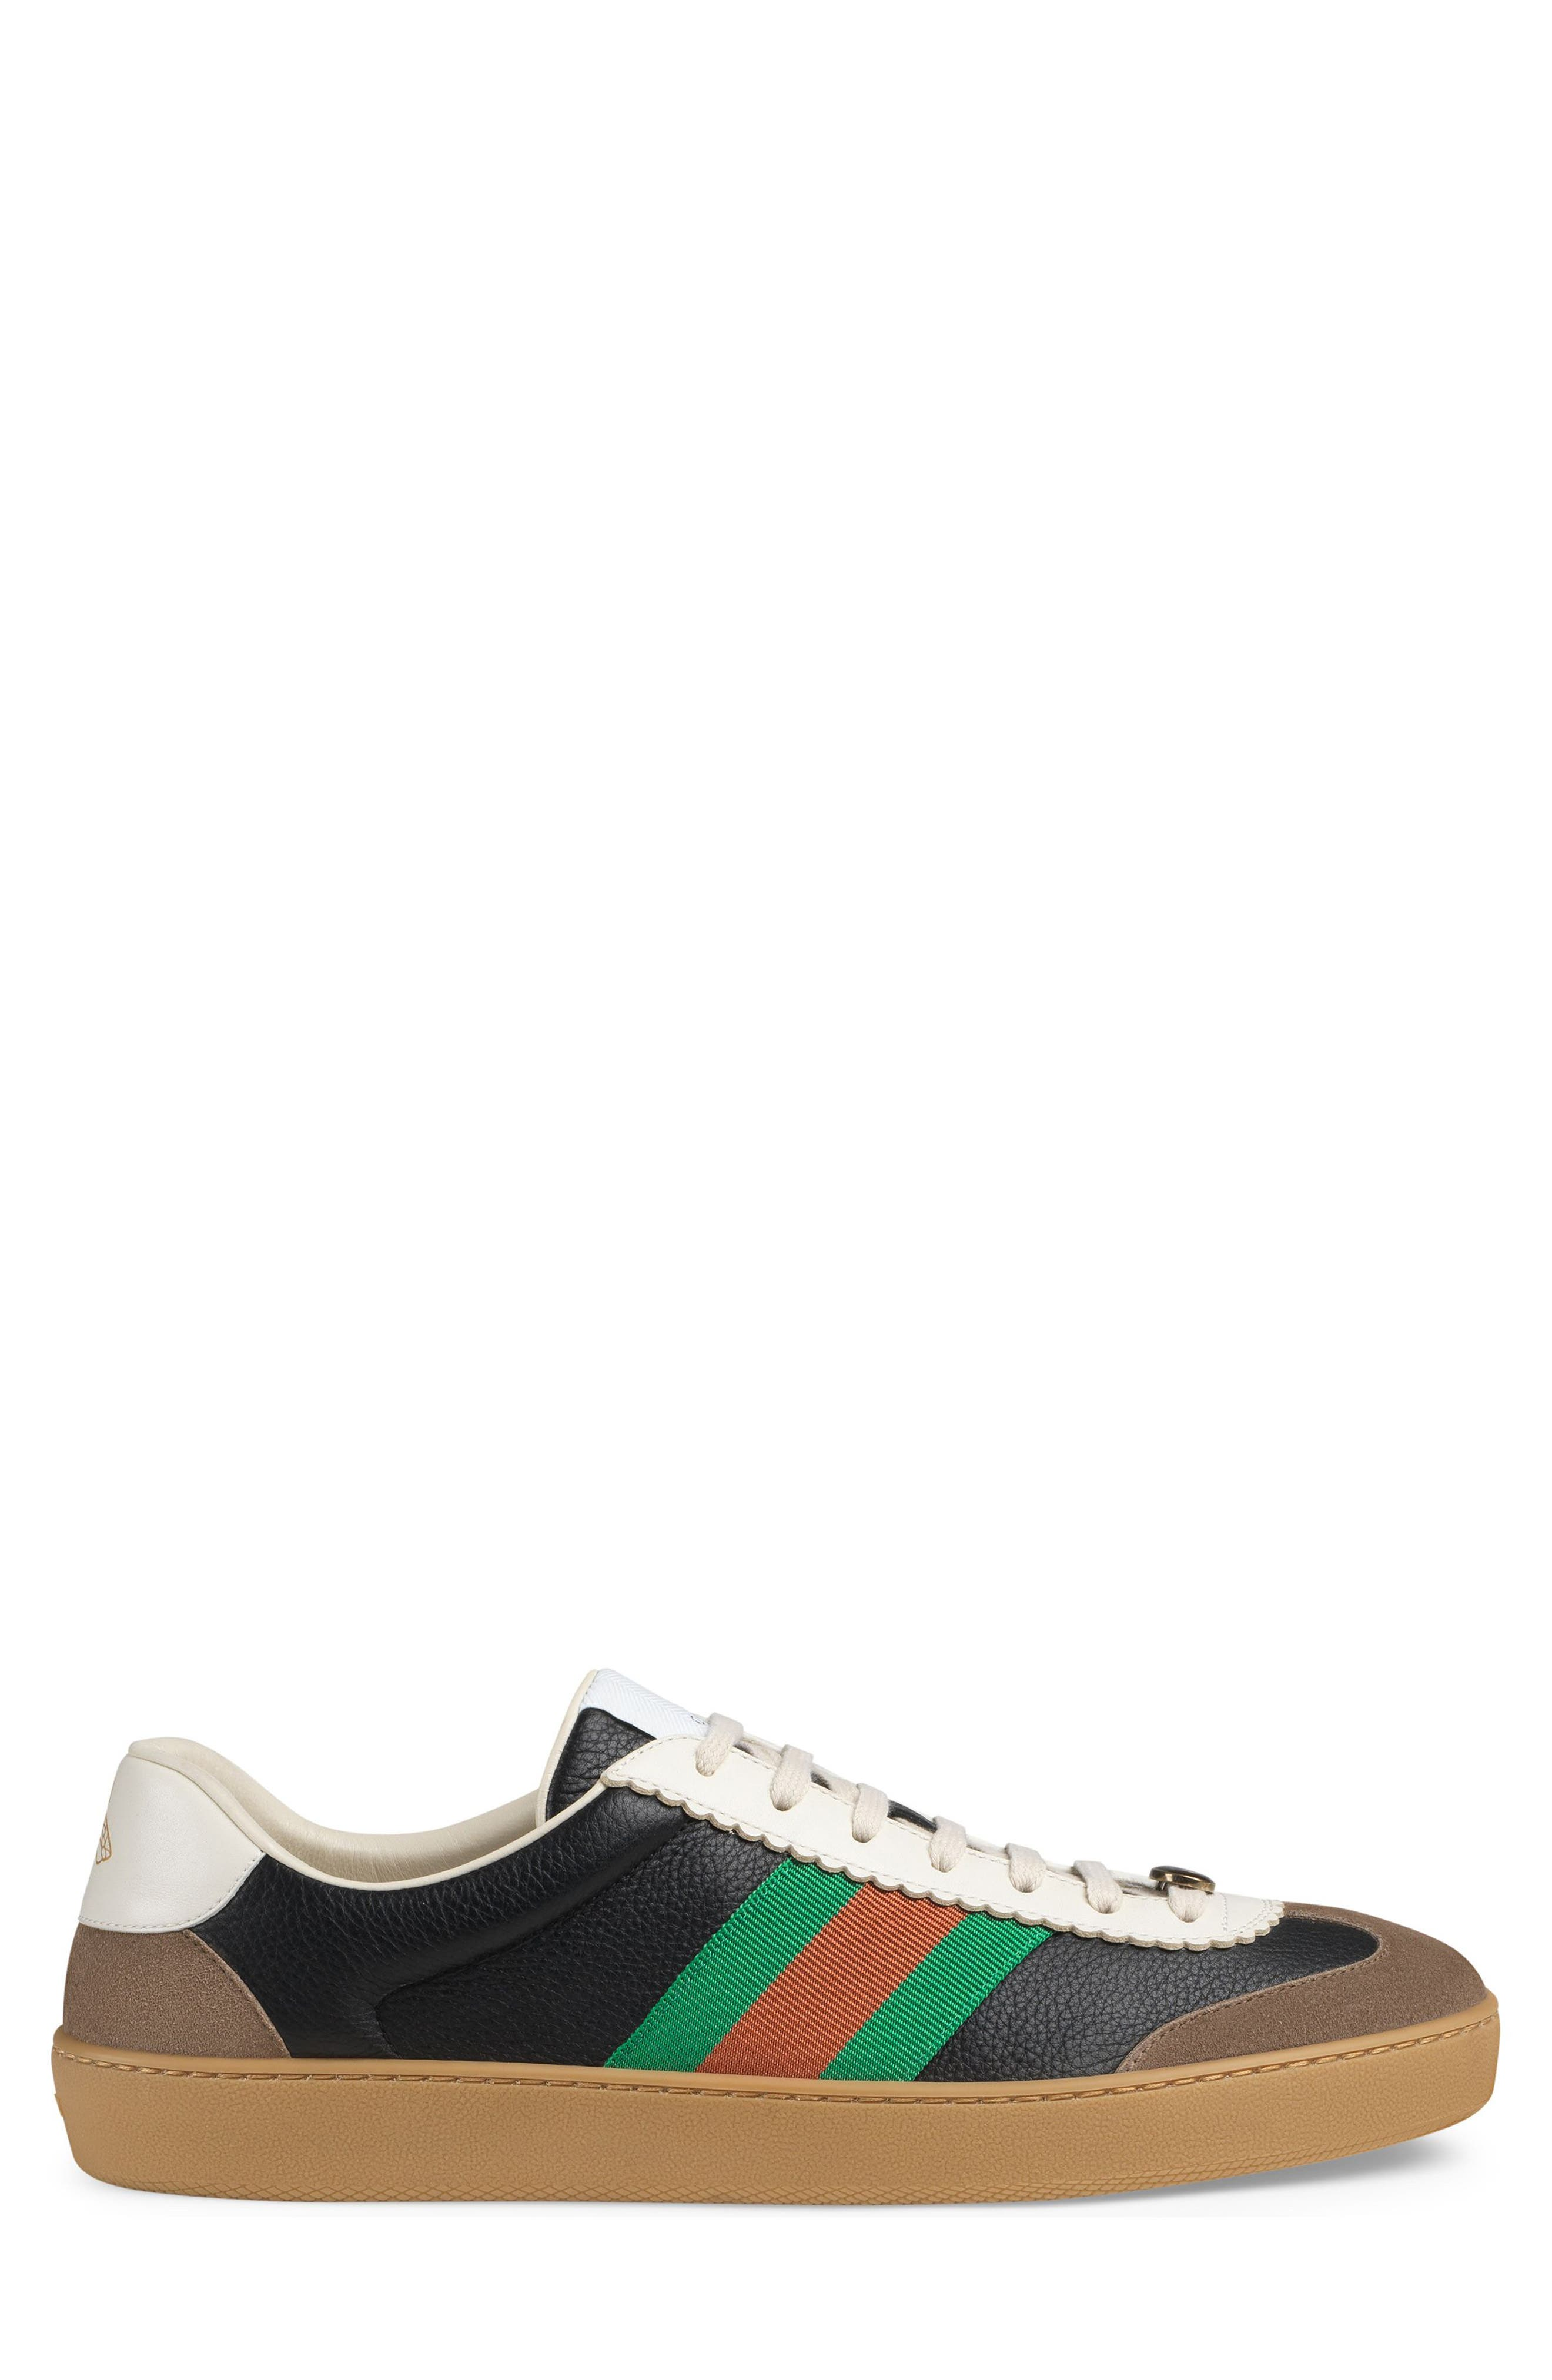 Web Sneaker,                             Alternate thumbnail 3, color,                             ARDESIA/ BLACK